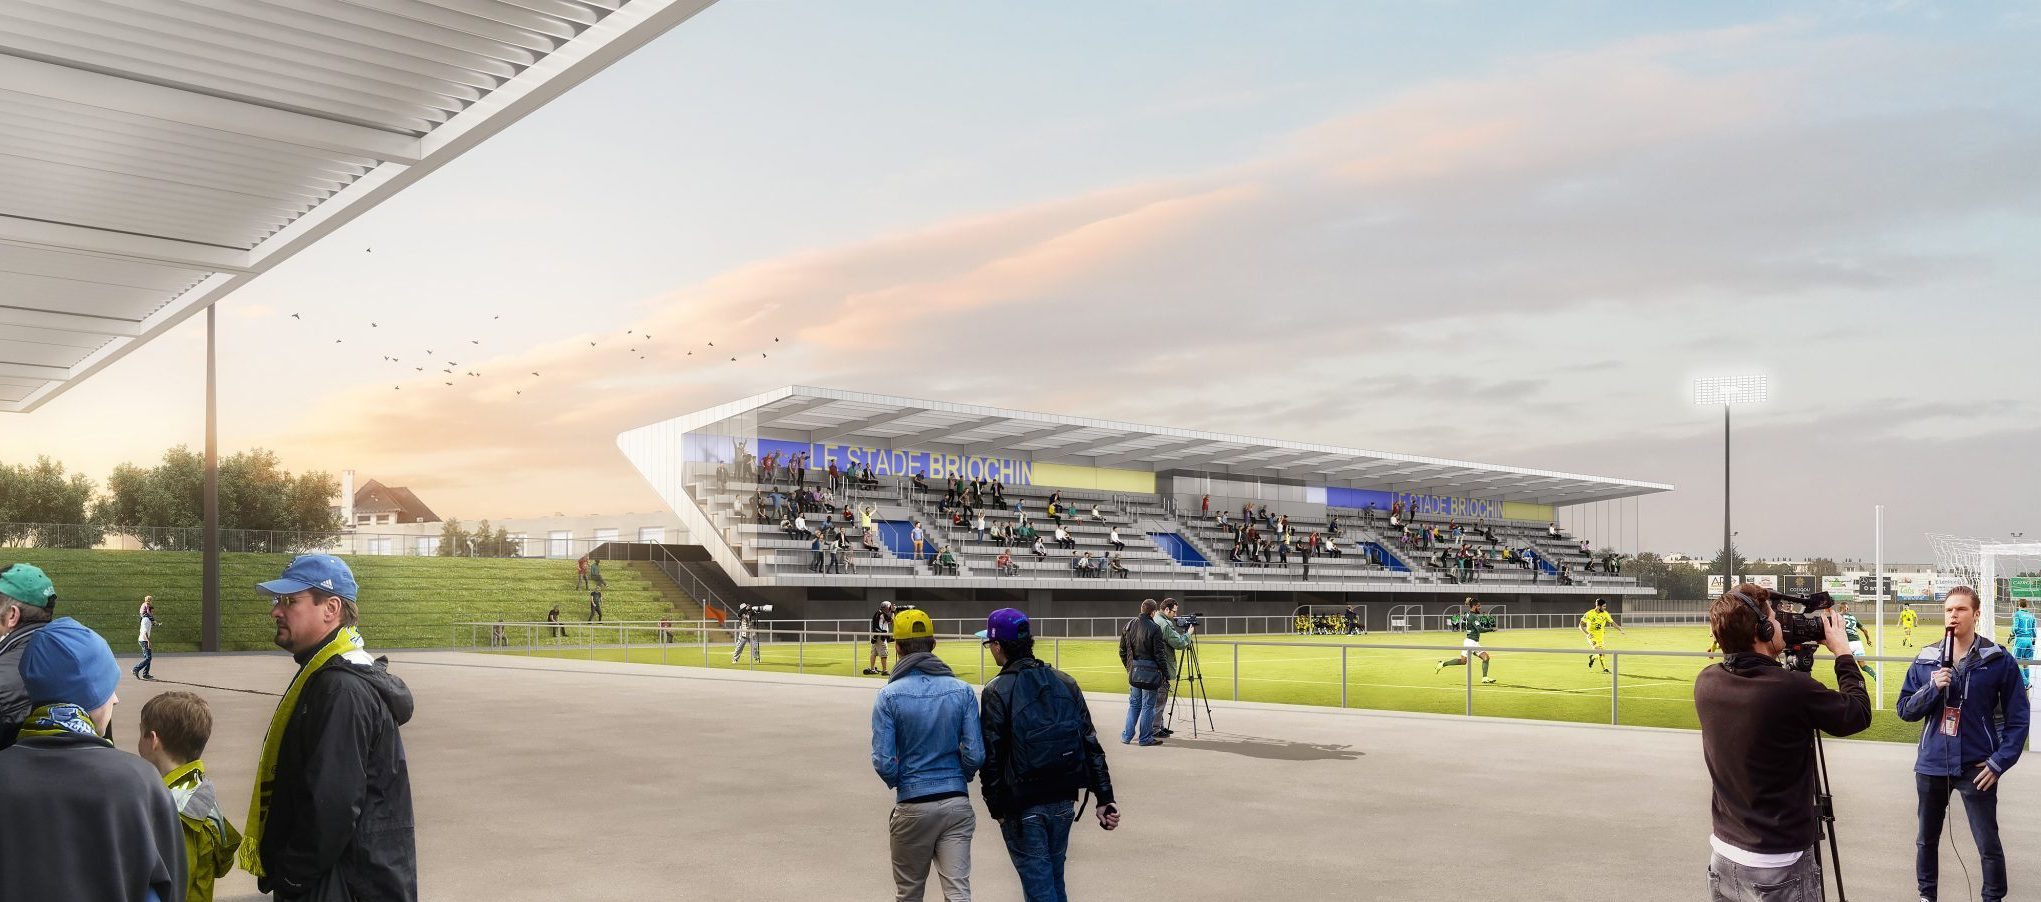 Tribune d'honneur Stade Fred Aubert - Saint-Brieuc